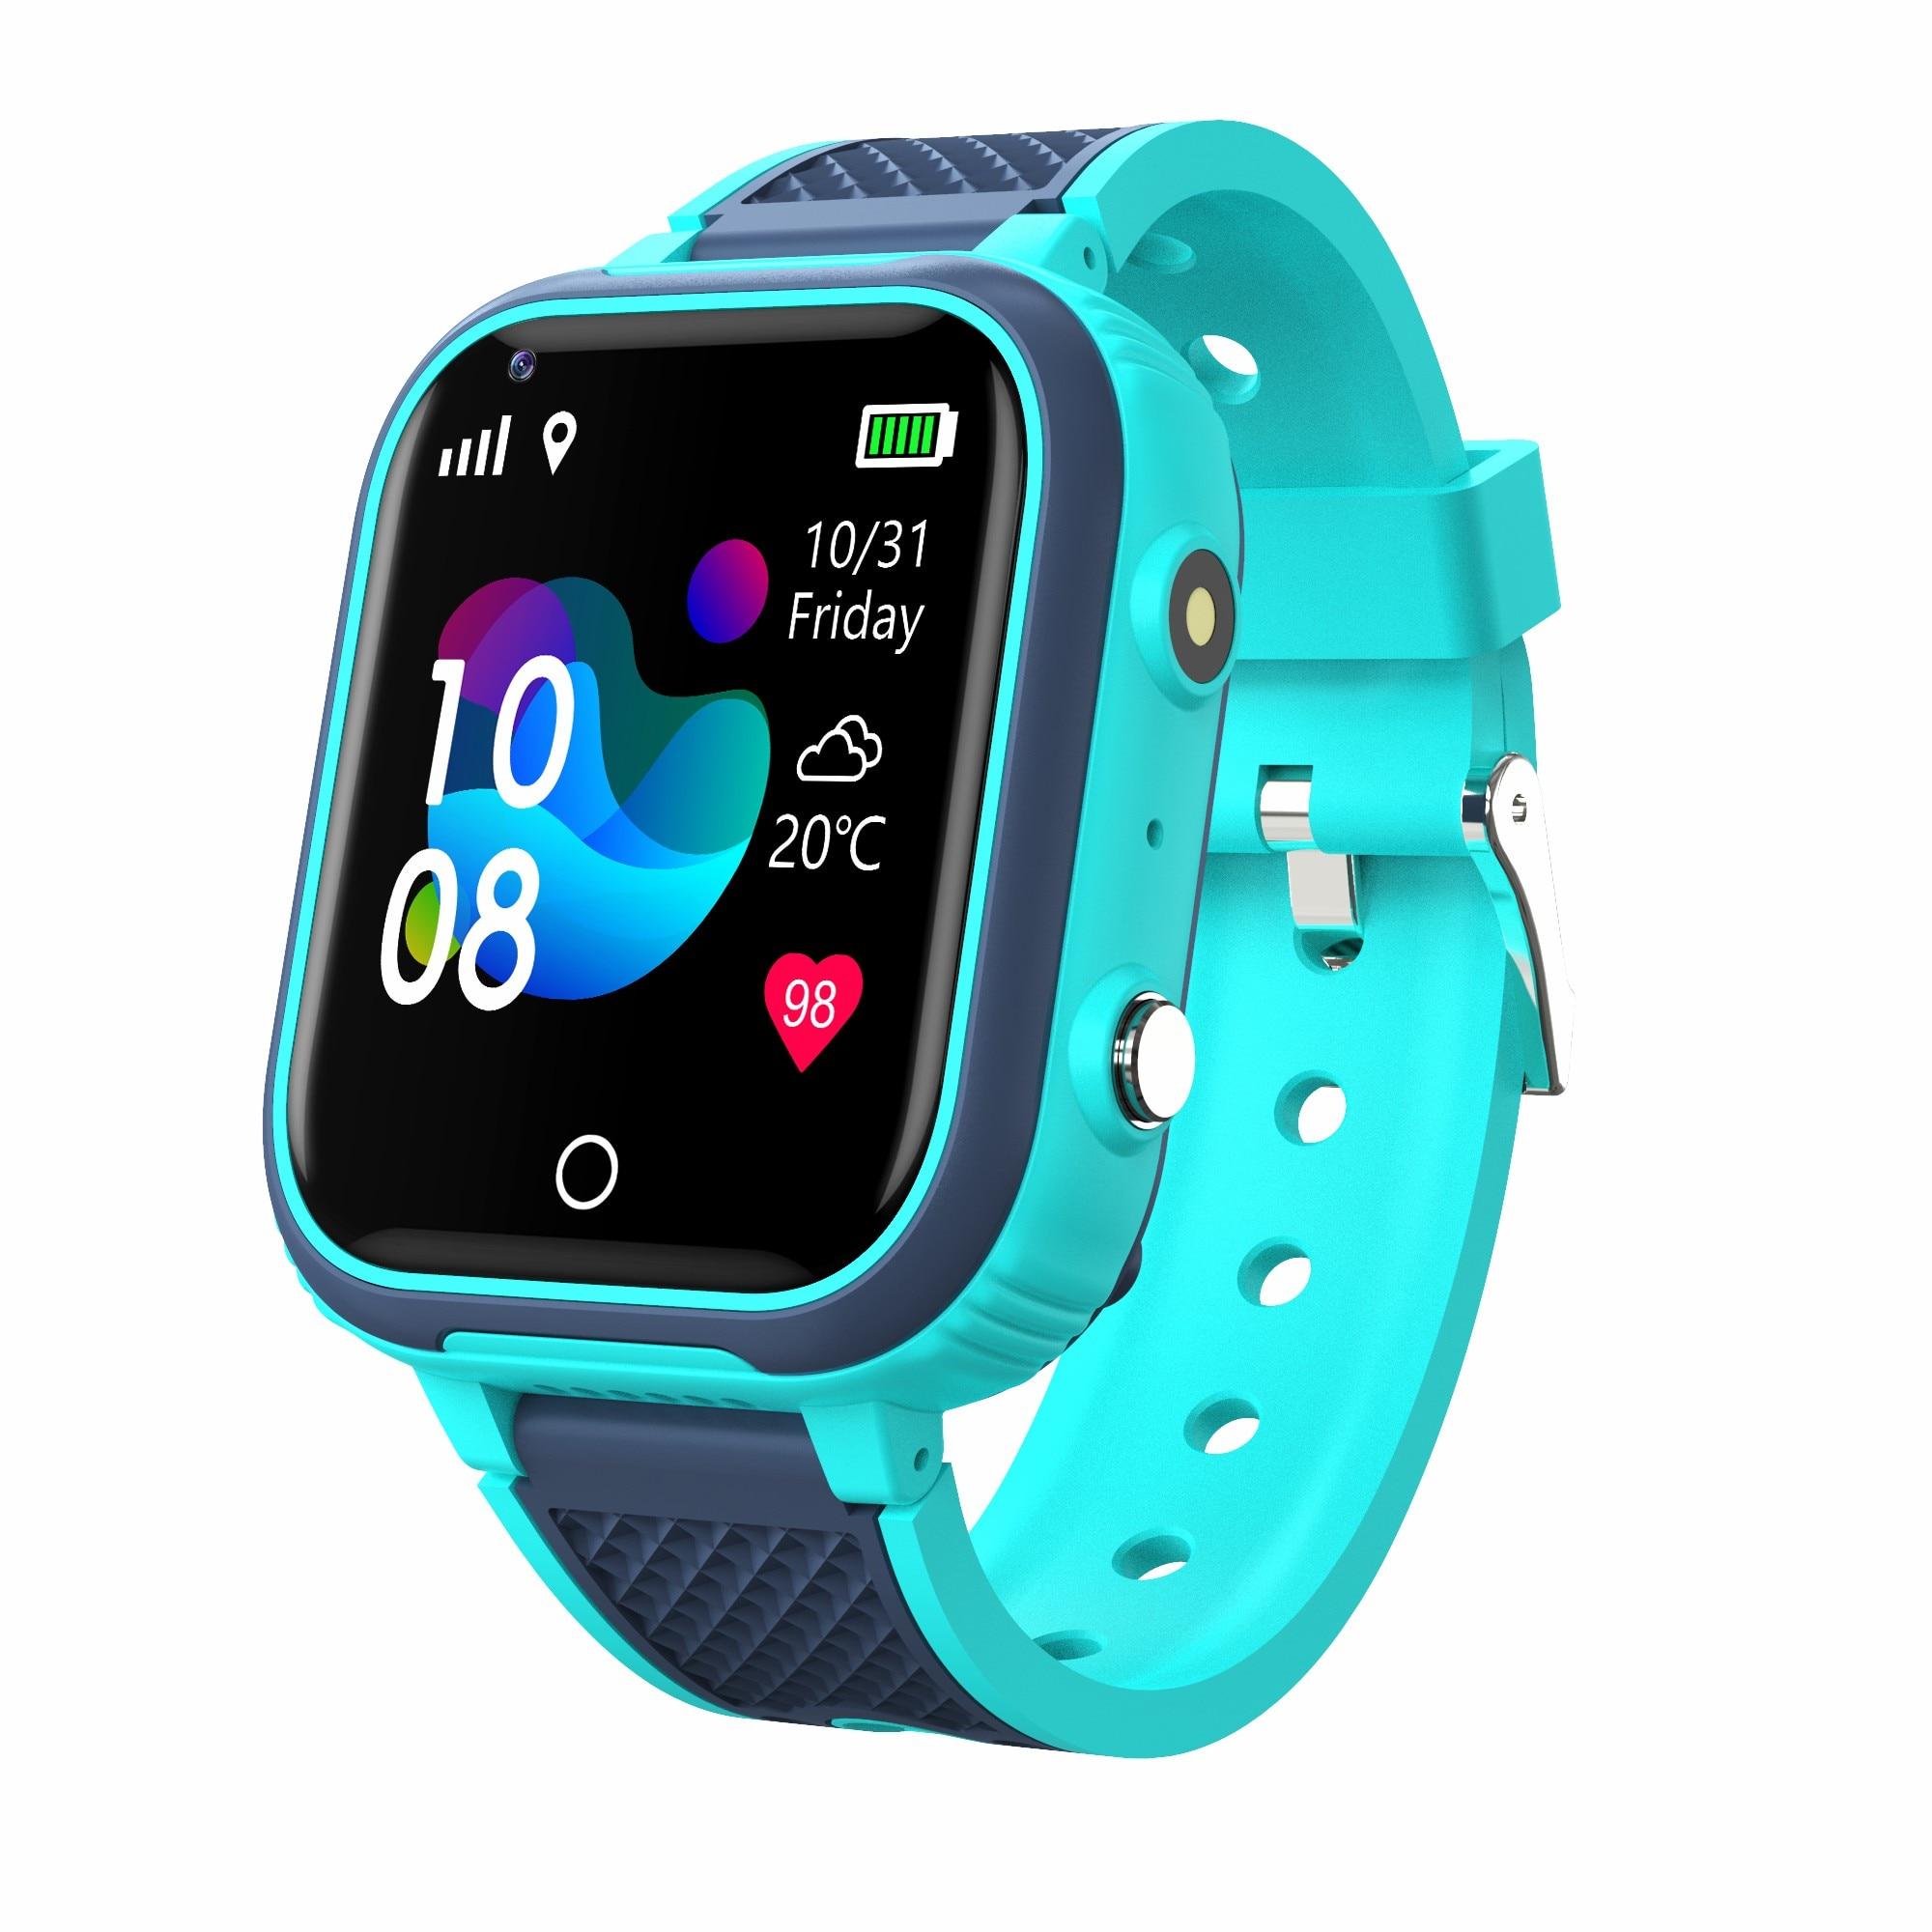 H89ff01cfa7ed410ca443caf5111092702 LT21 4G Smart Watch Kids GPS WIFI Video Call SOS IP67 Waterproof Child Smartwatch Camera Monitor Tracker Location Phone Watch